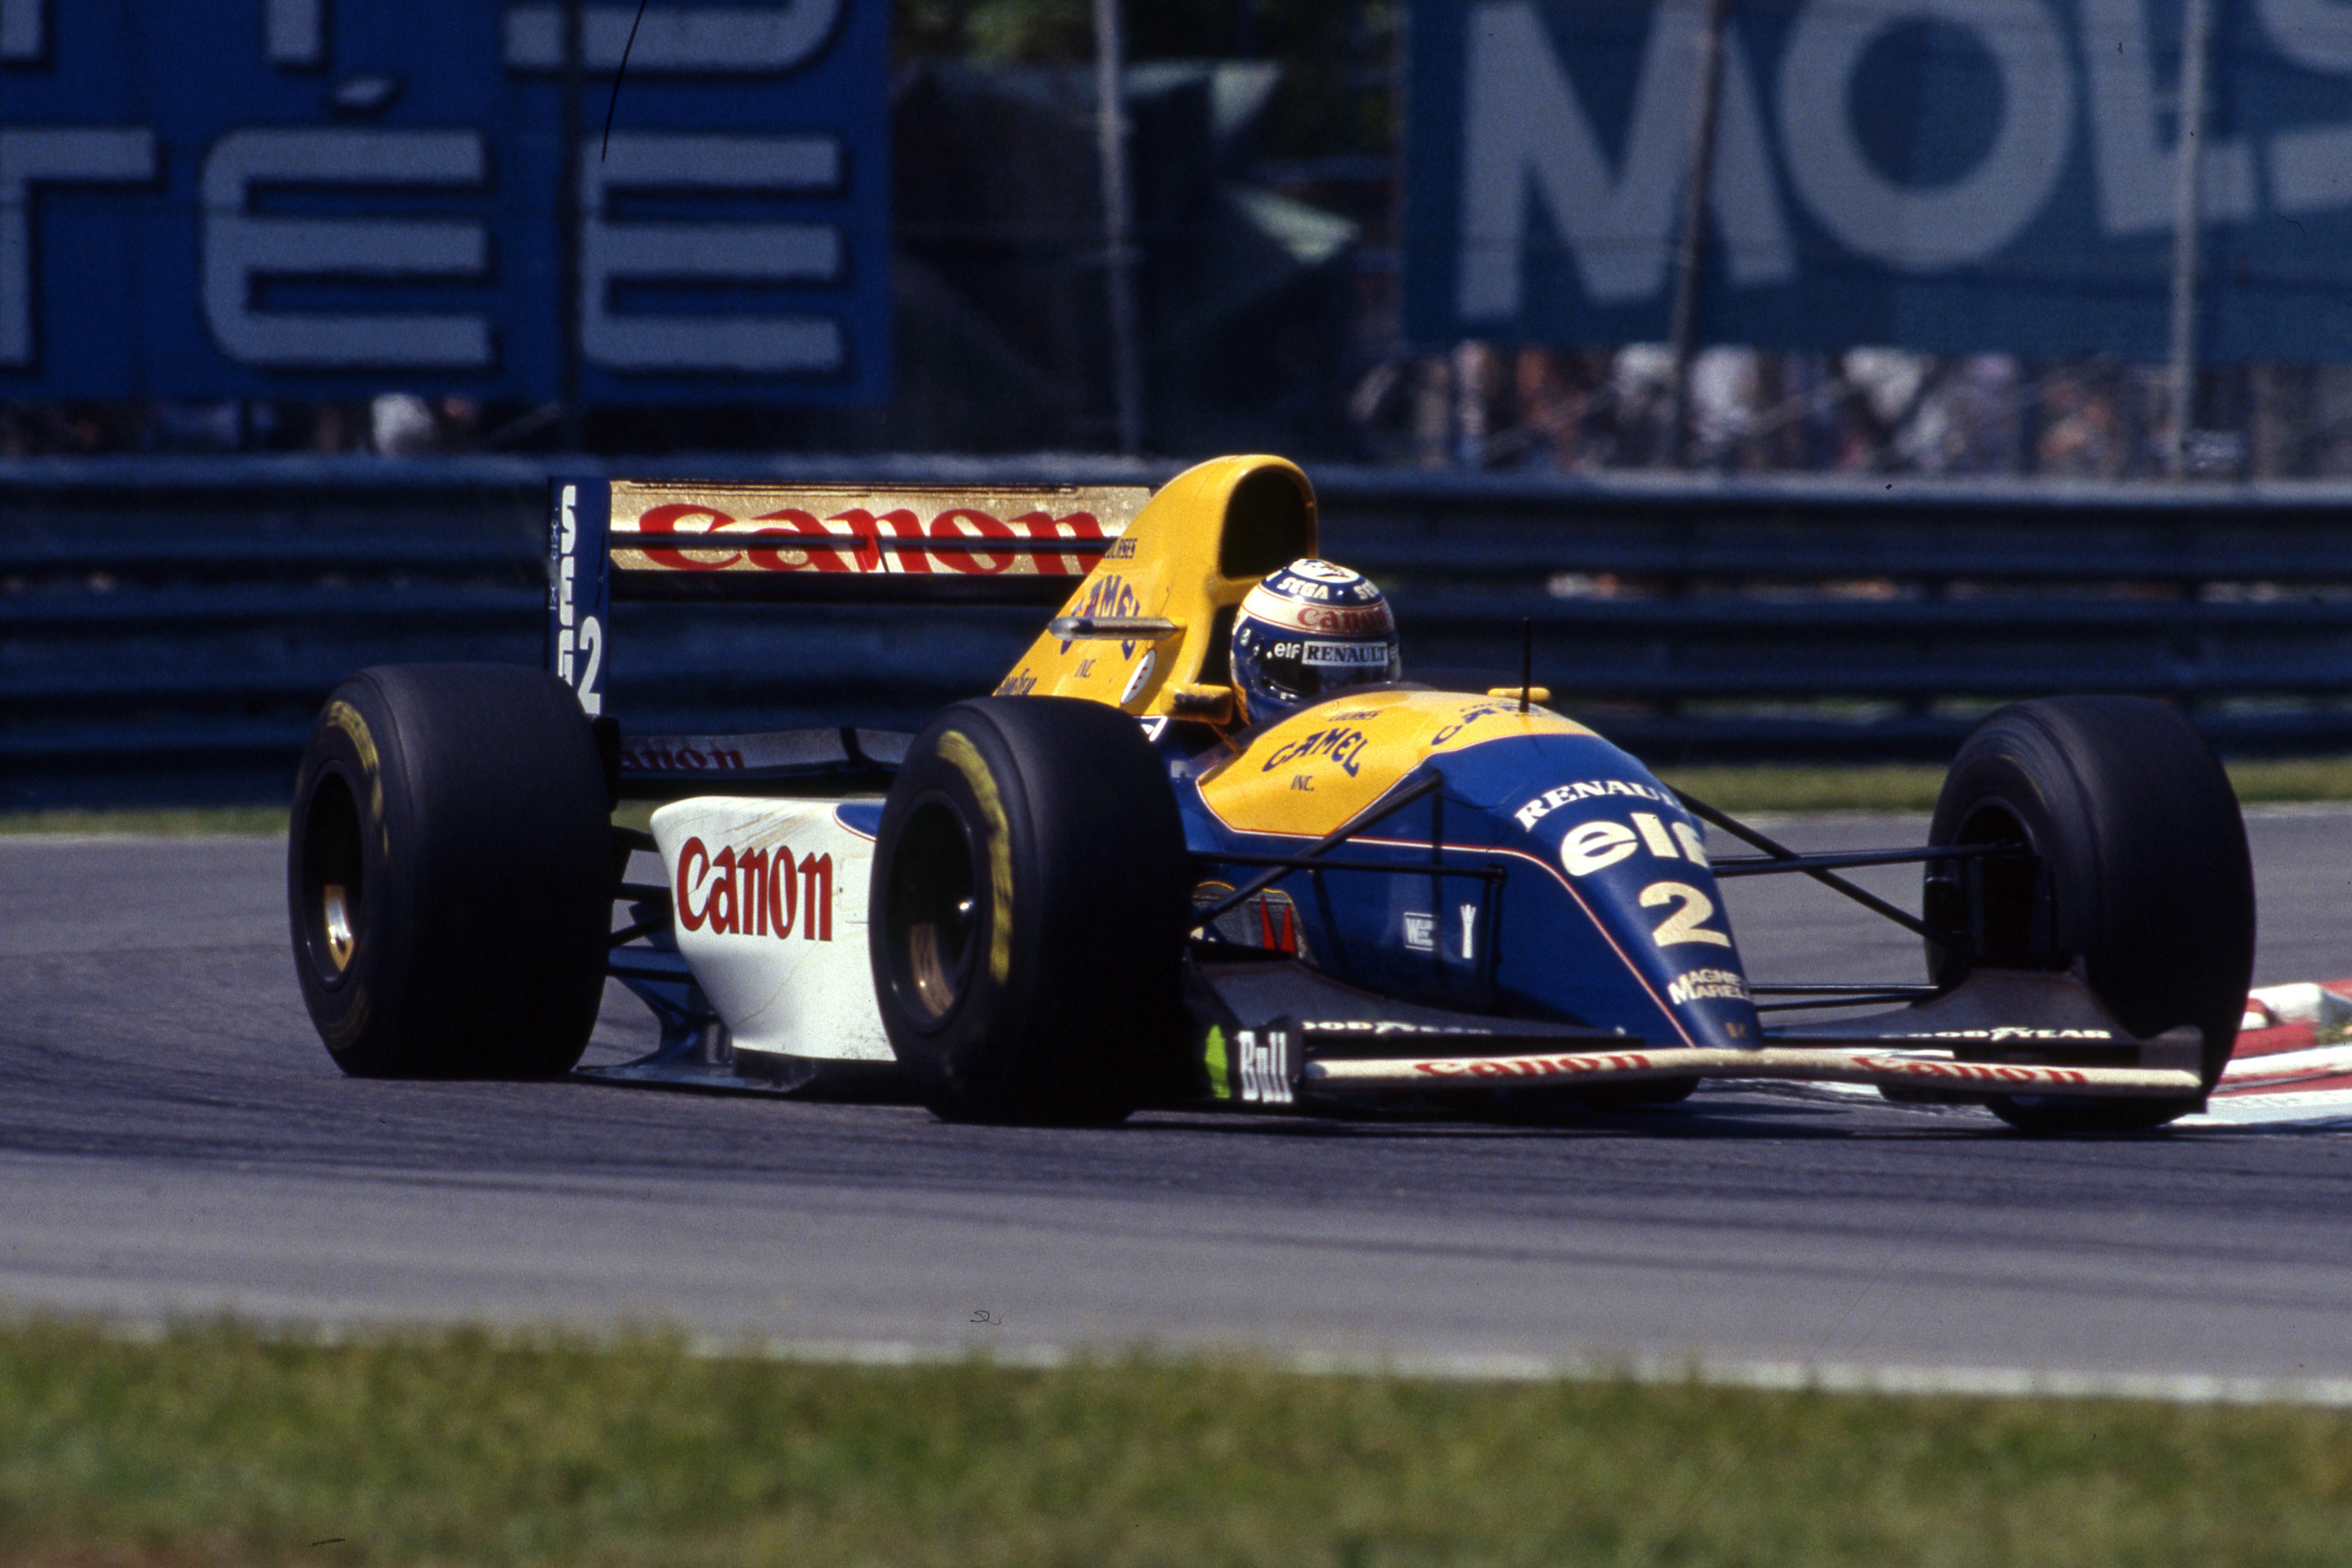 Australian Grand Prix Adelaide (aus) 05 07 11 1993